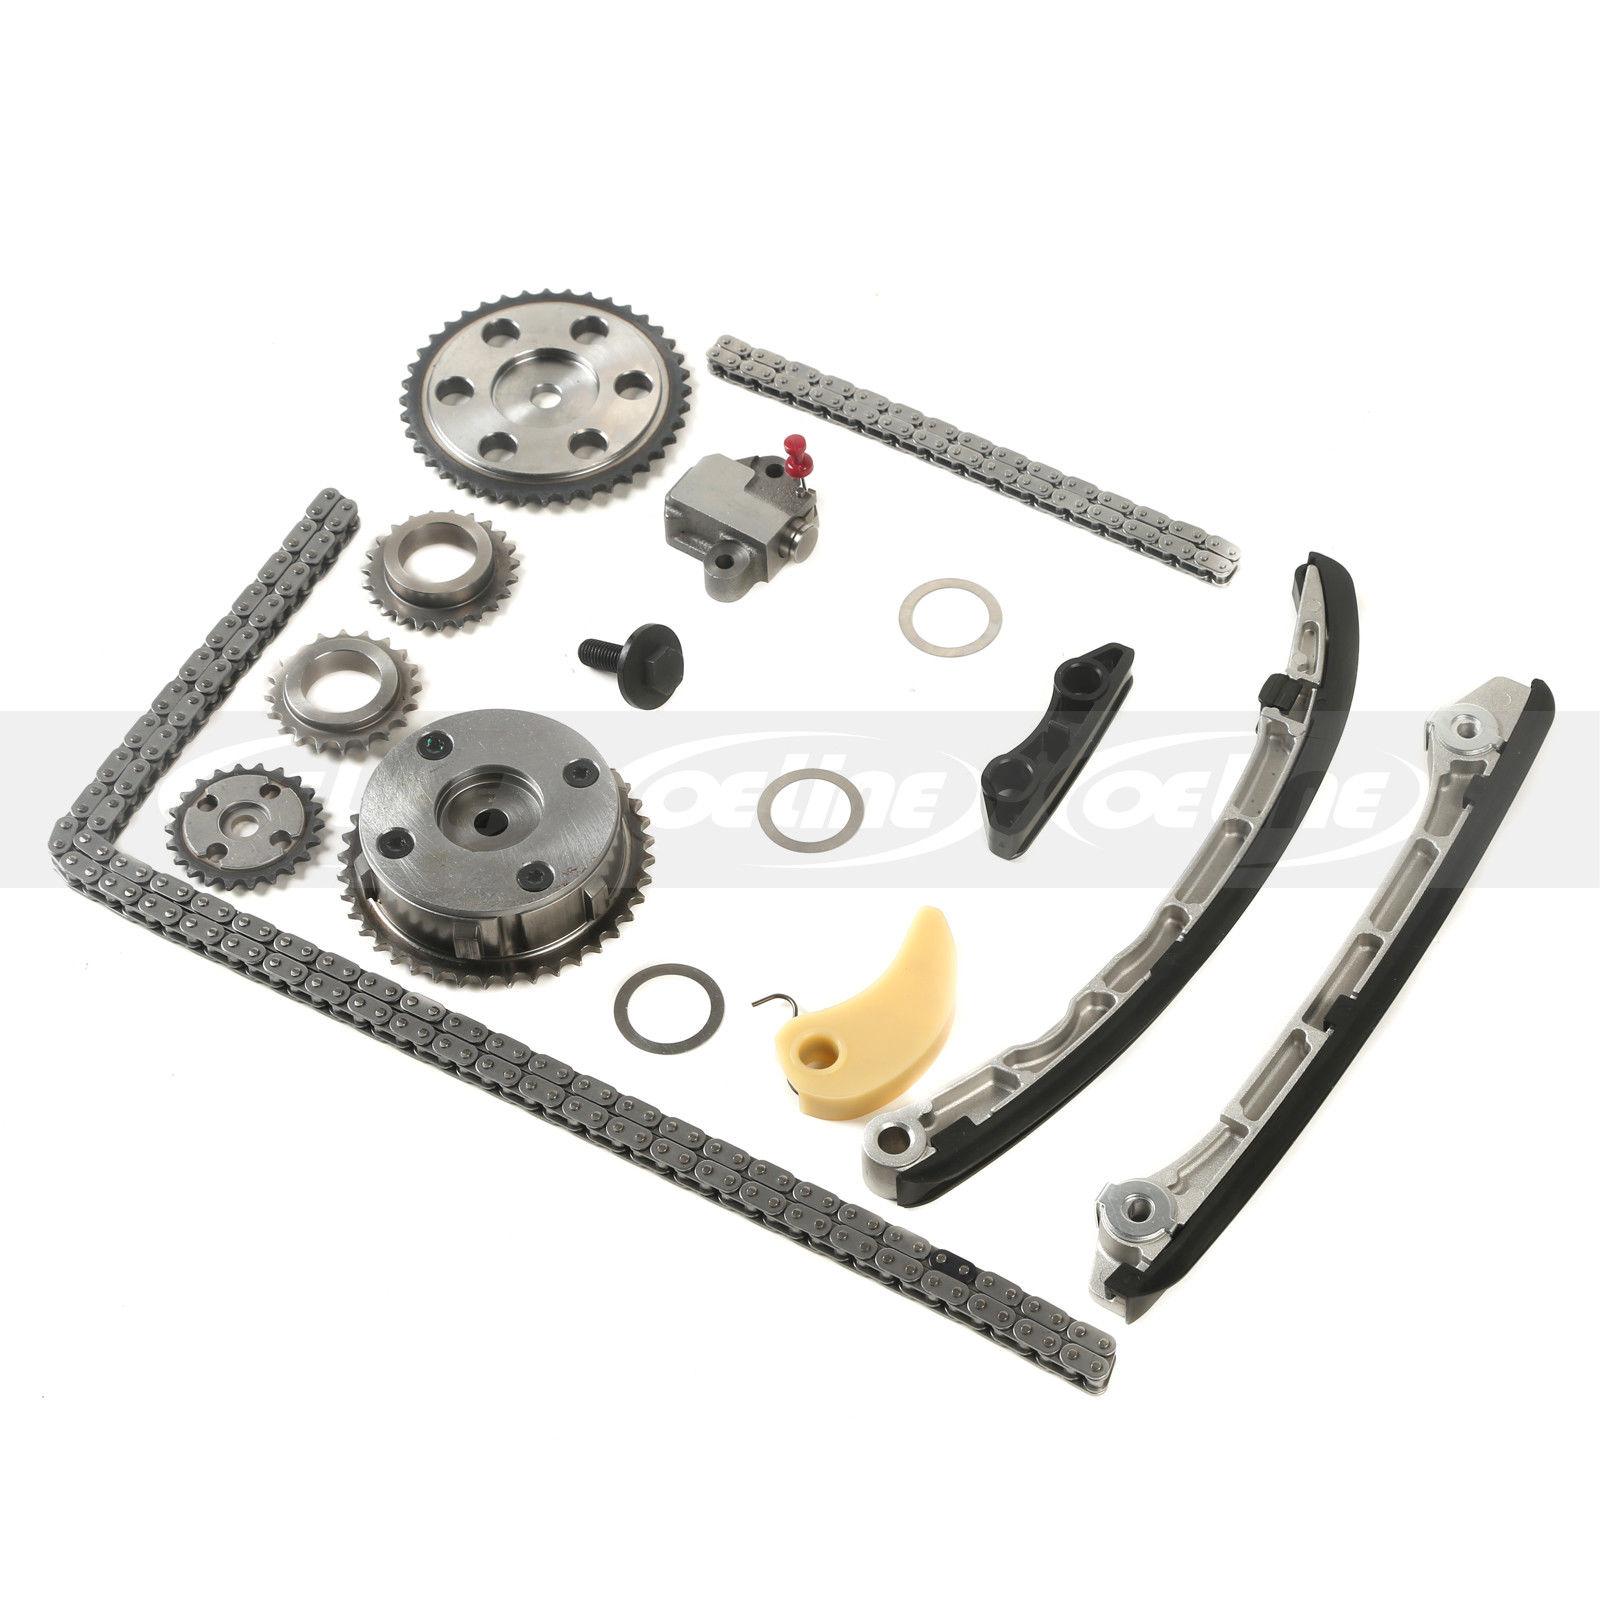 Used Timing Chain Kit Amp Vvt For 06 13 Mazda 3 6 Mazdaspeed